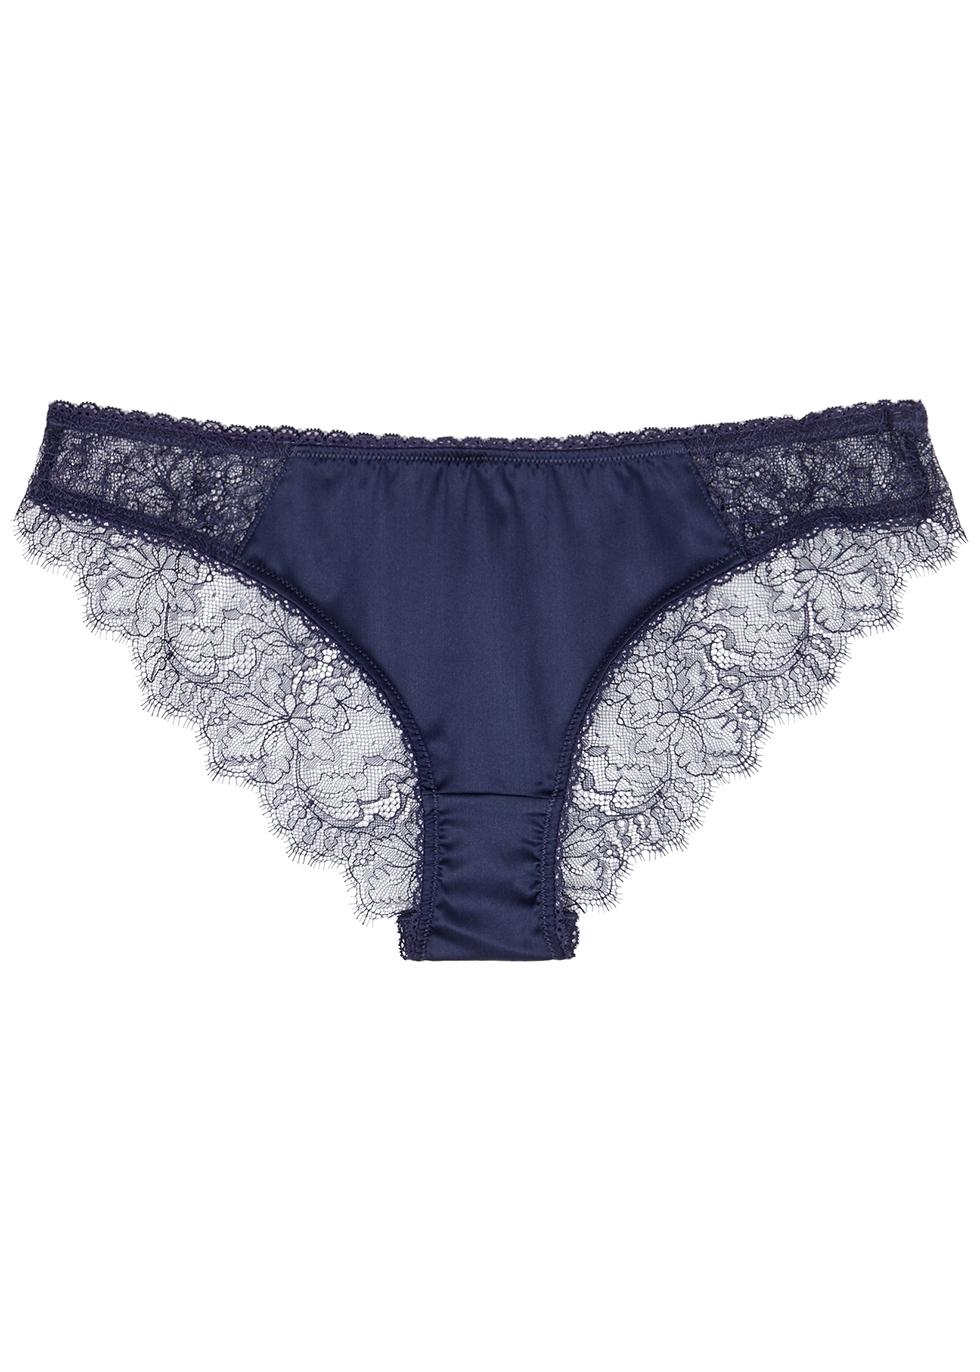 Gigi Giggling navy lace briefs - Stella McCartney